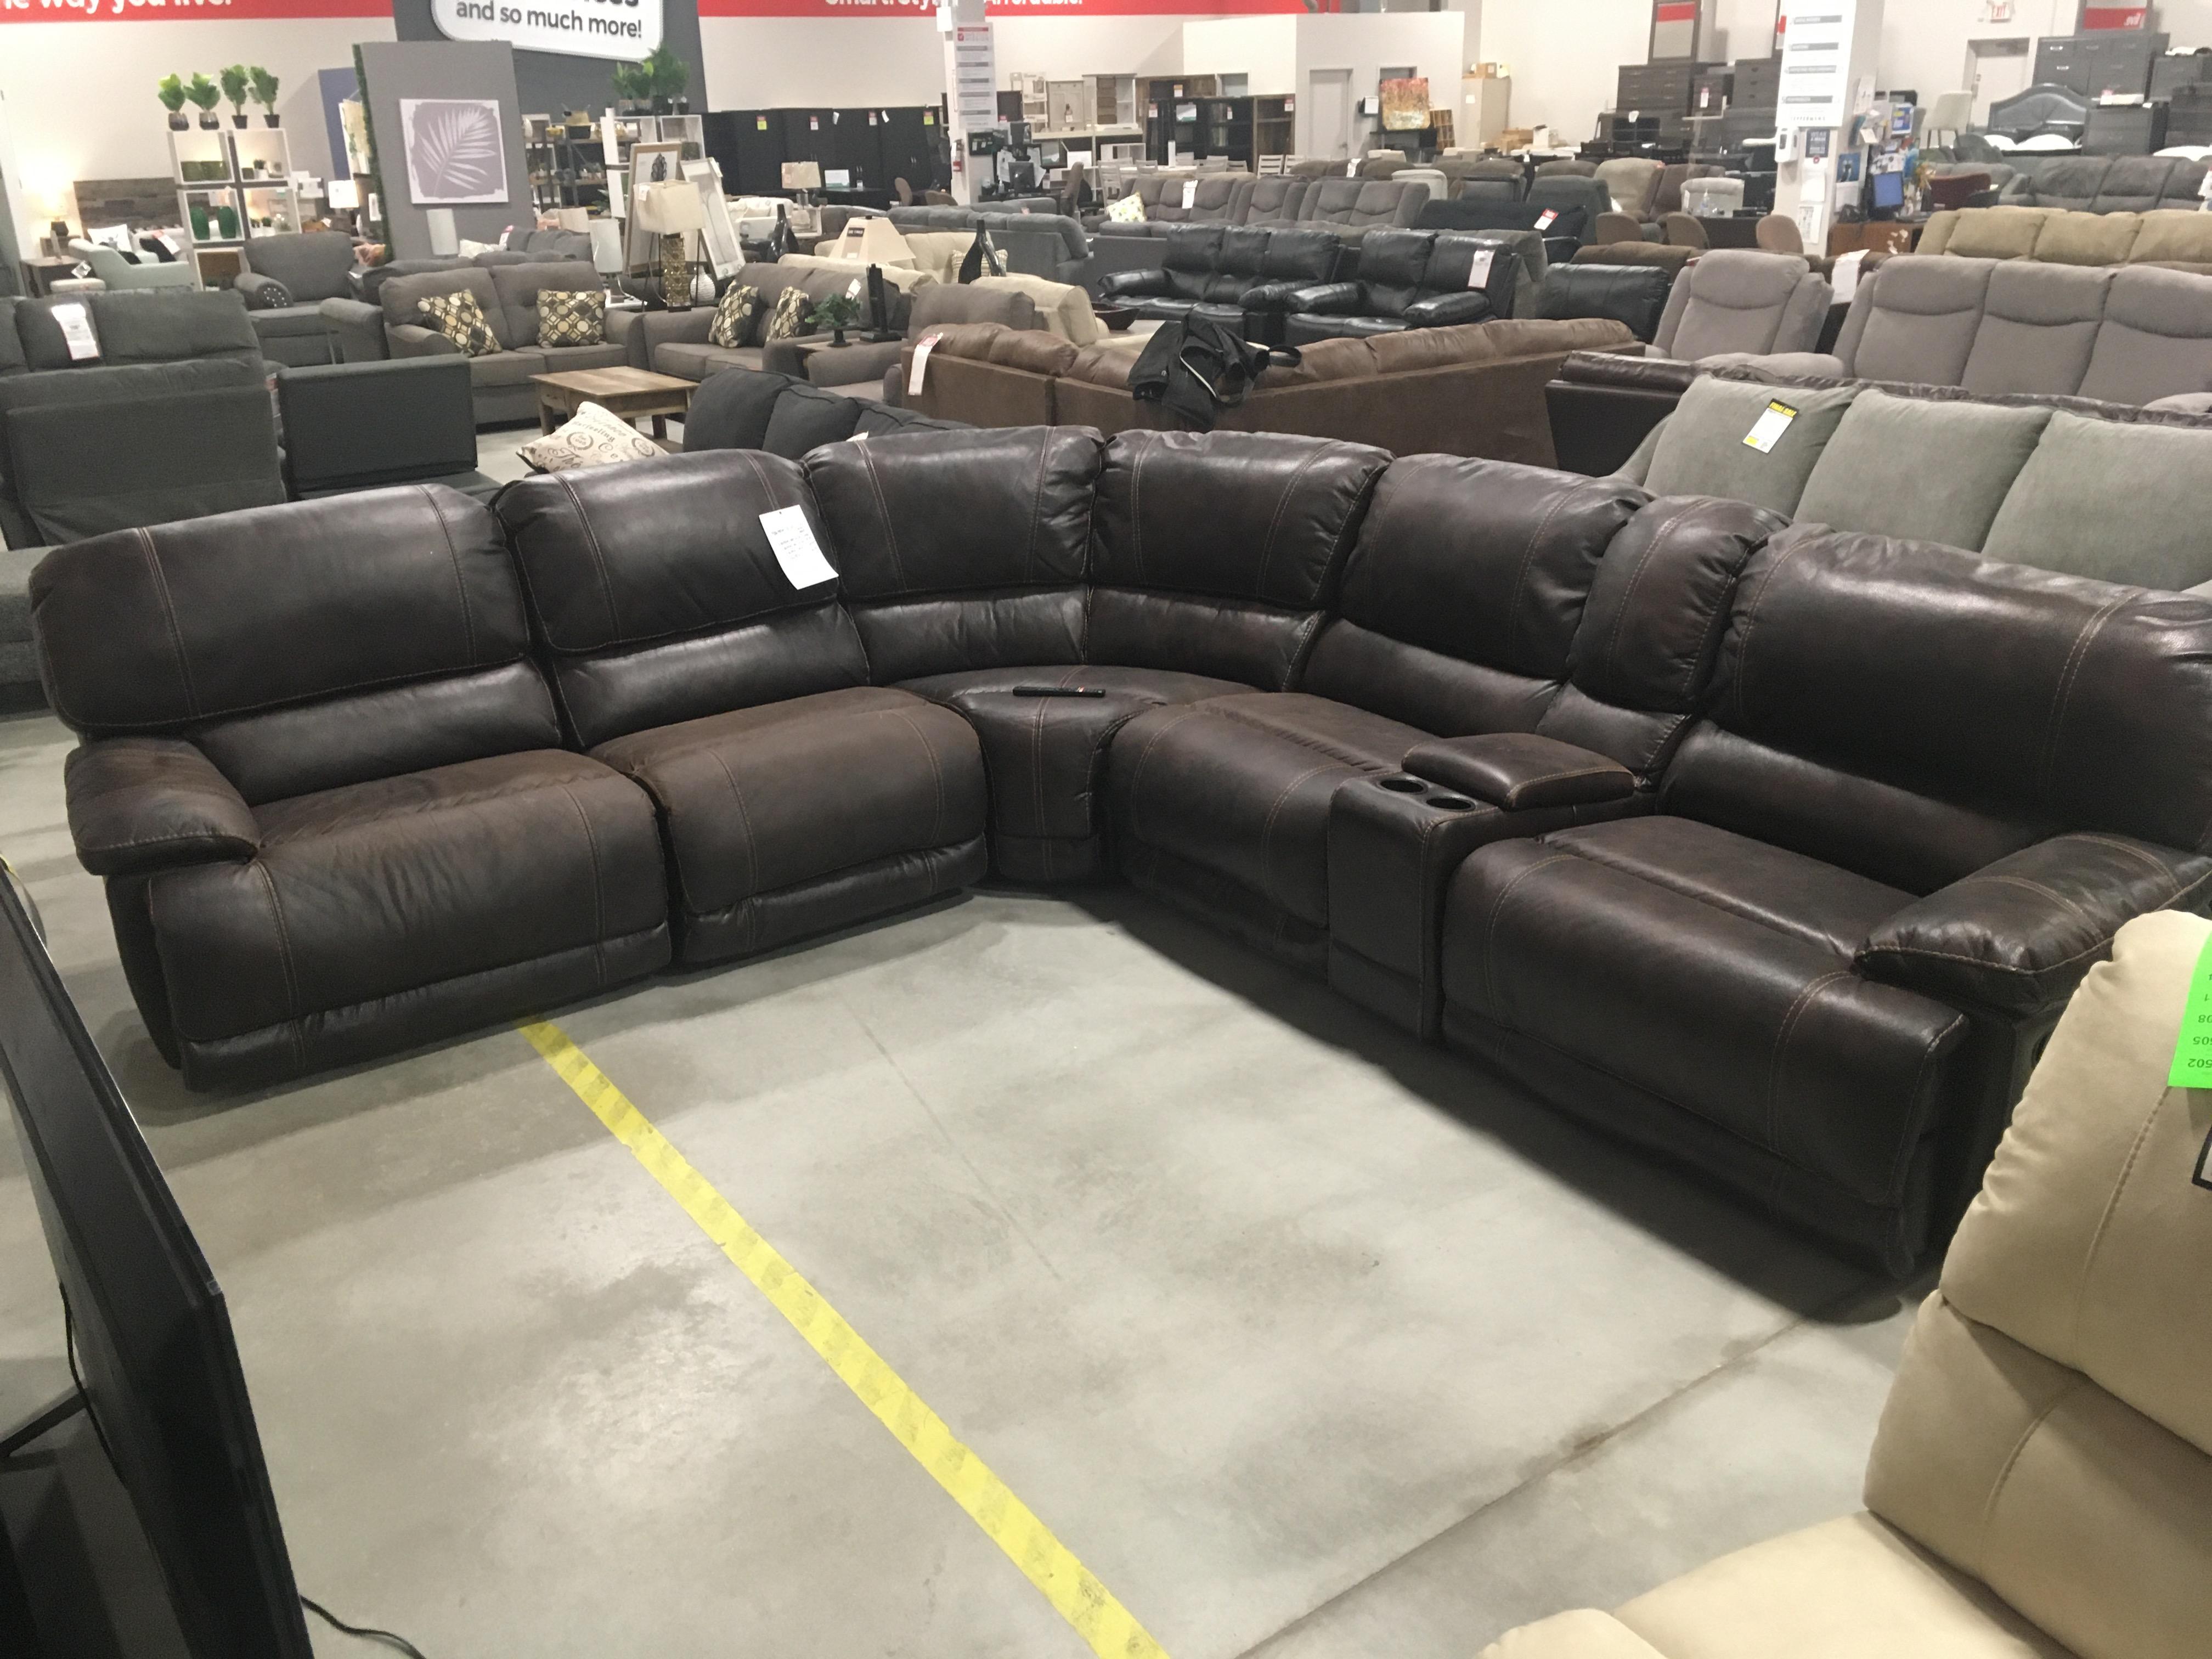 Scratch N Dent Furniture Auction